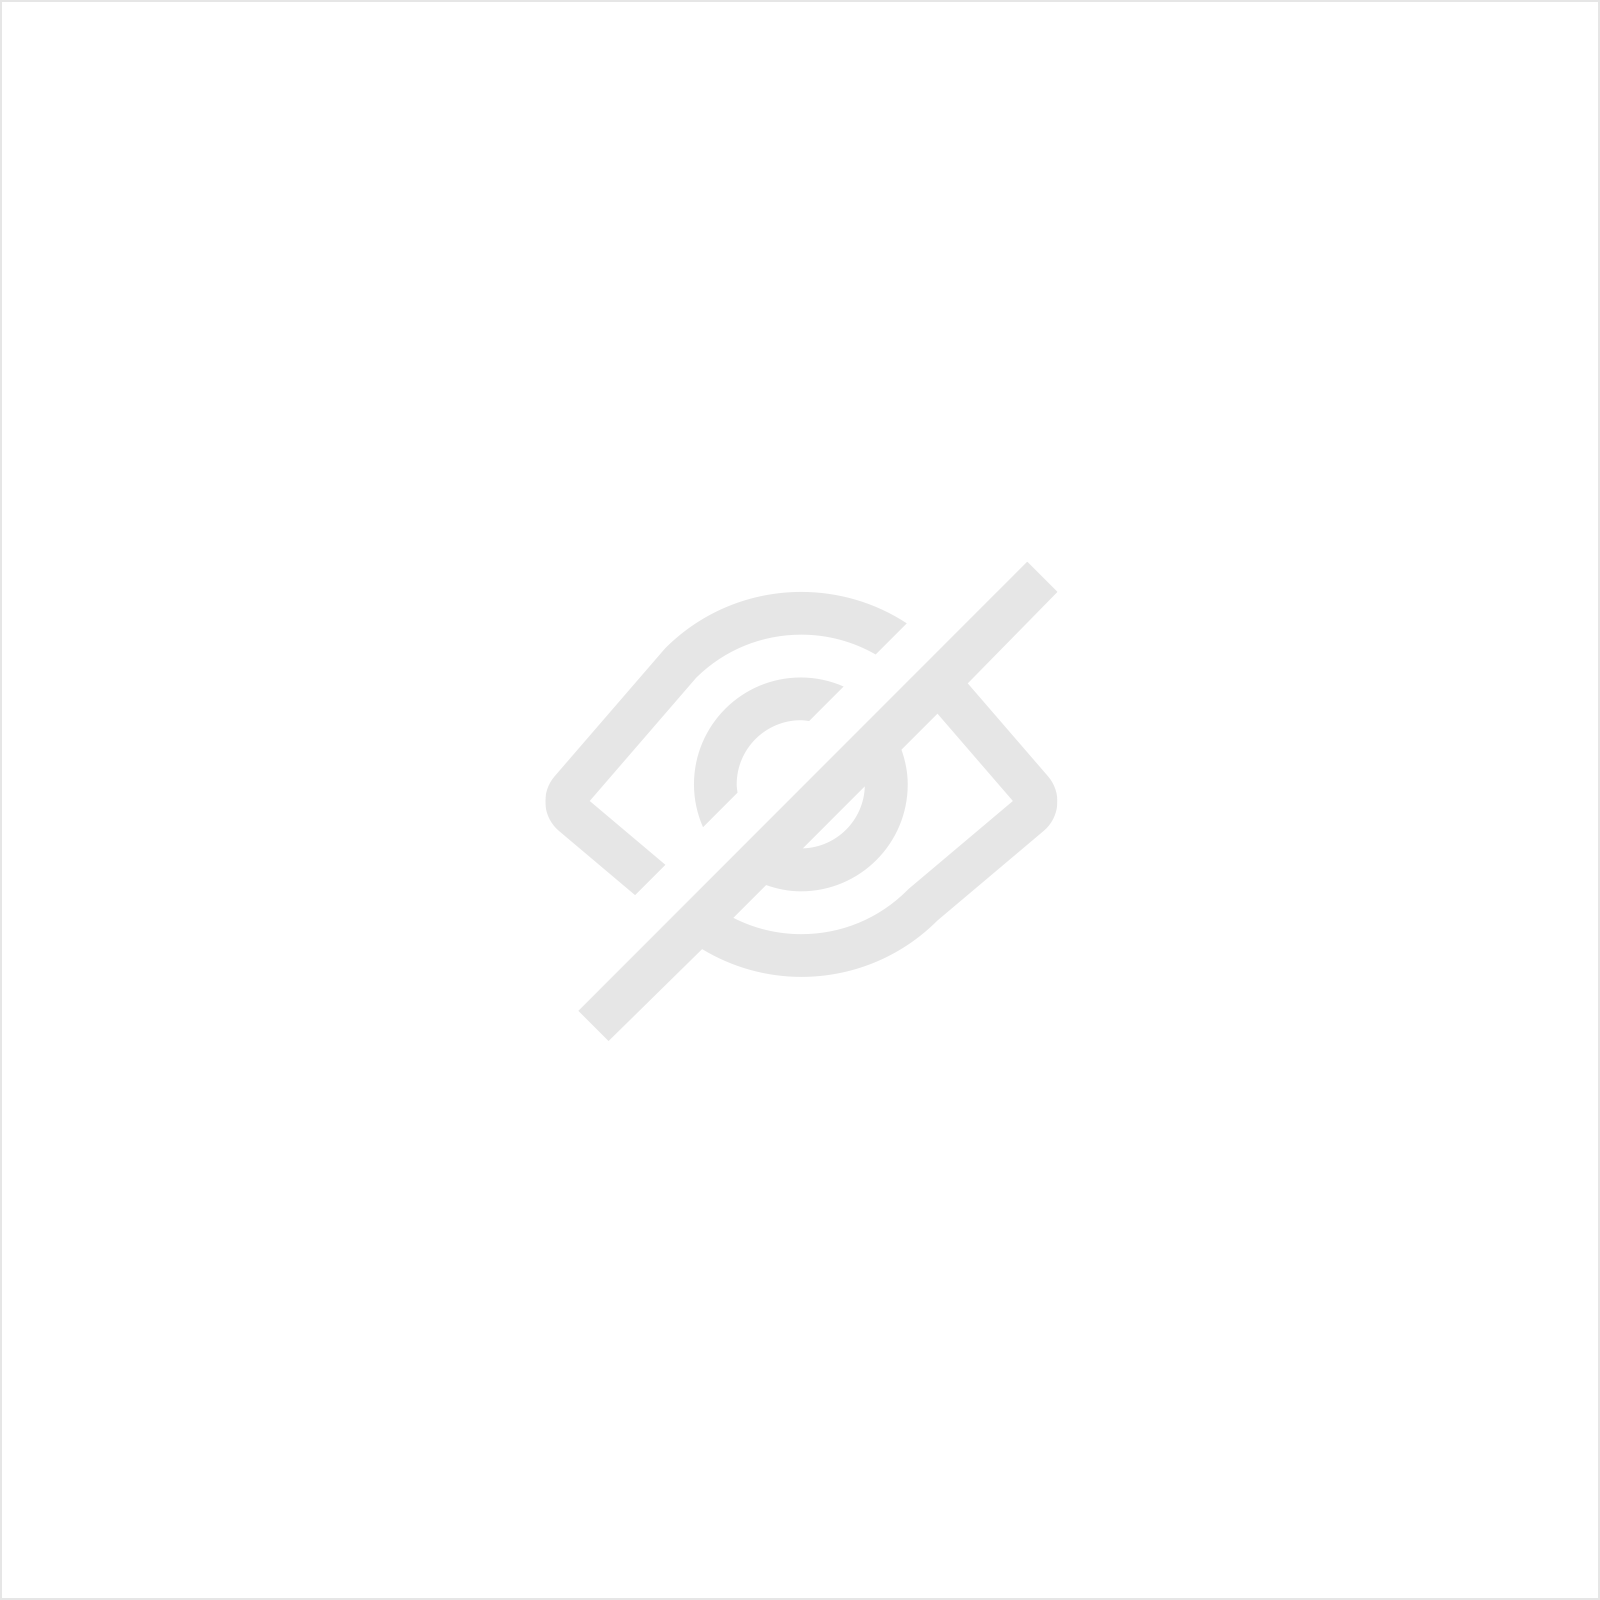 AUTOSOL ACIER INOXYDABLE PATE A POLIR AUTOSOL  750 ML